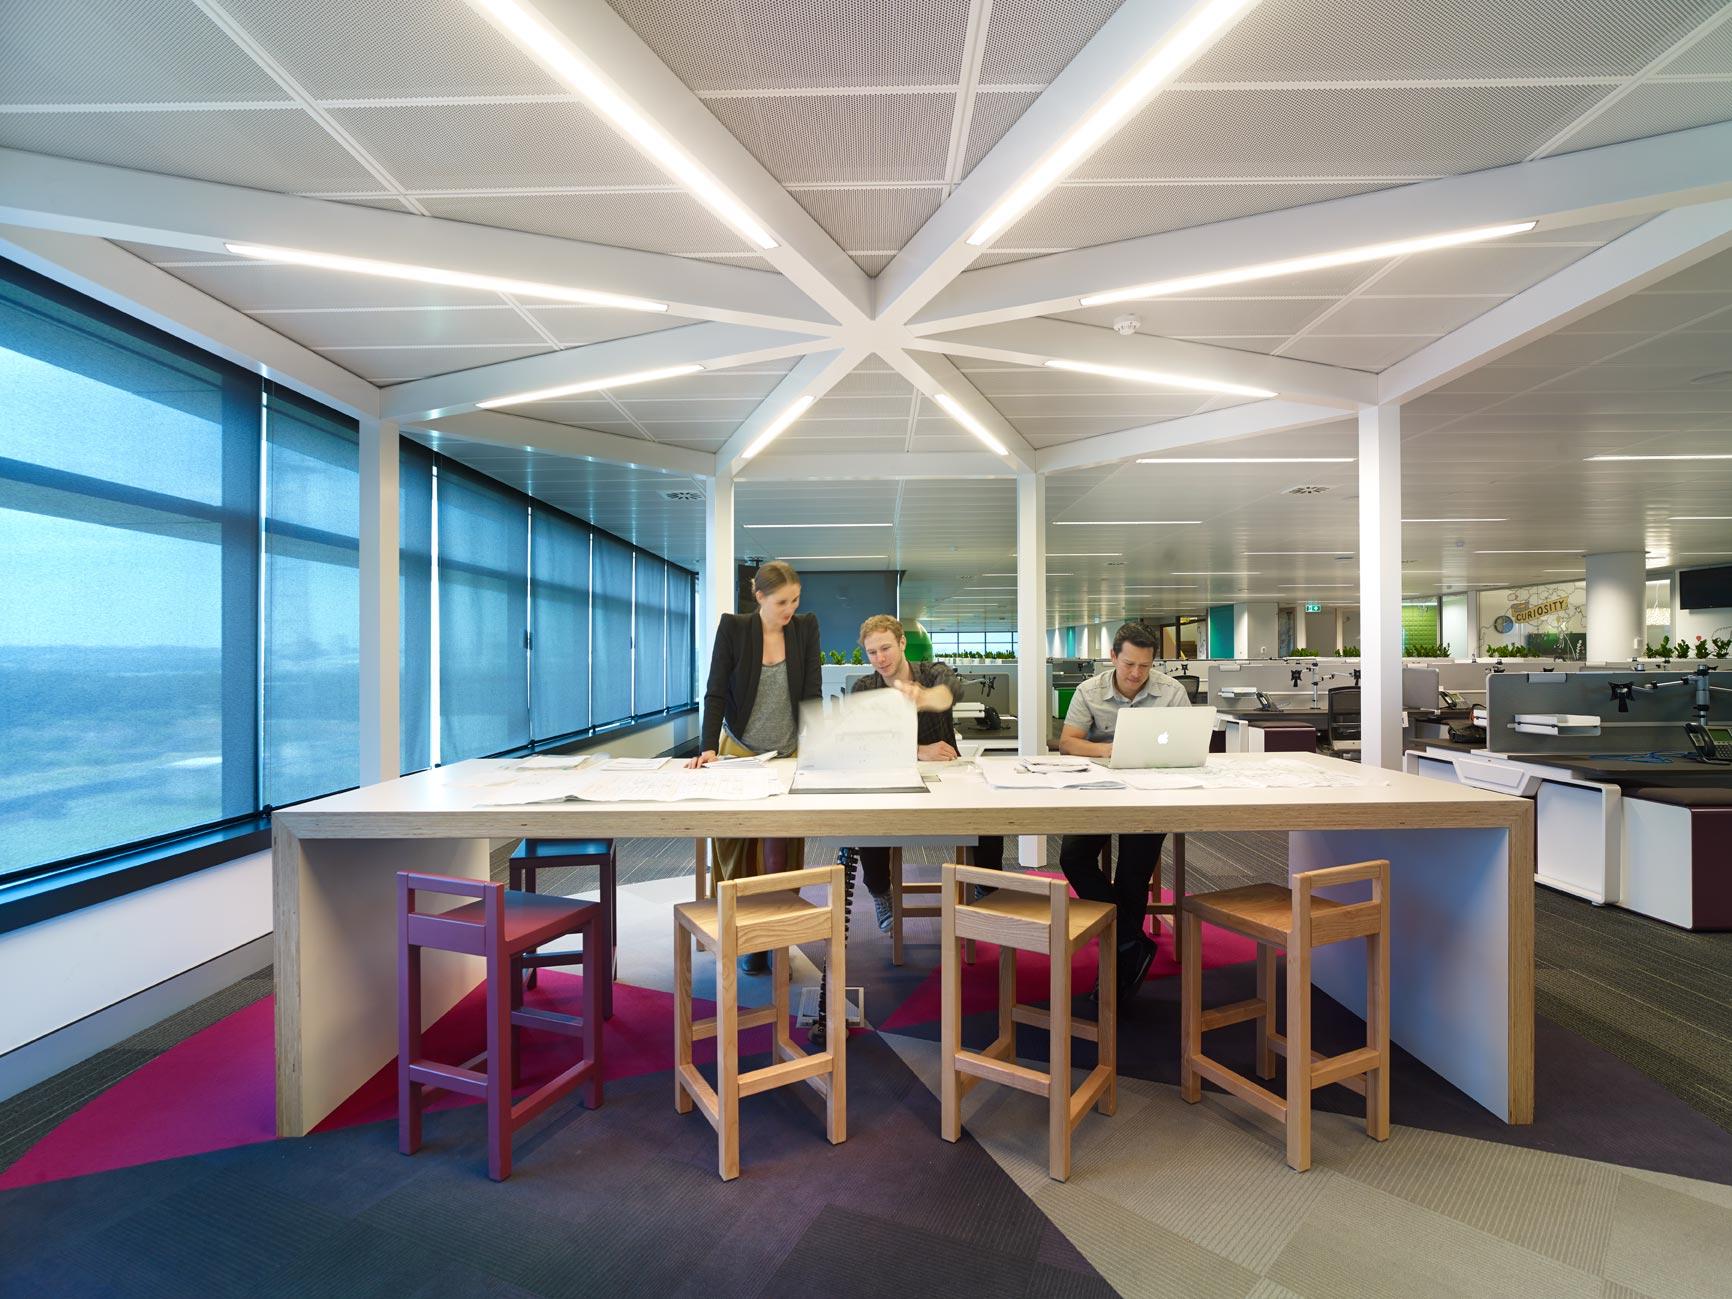 Lion- Tenant Representation, Interior Design, Project & Construction Management Project Image 4 PCG